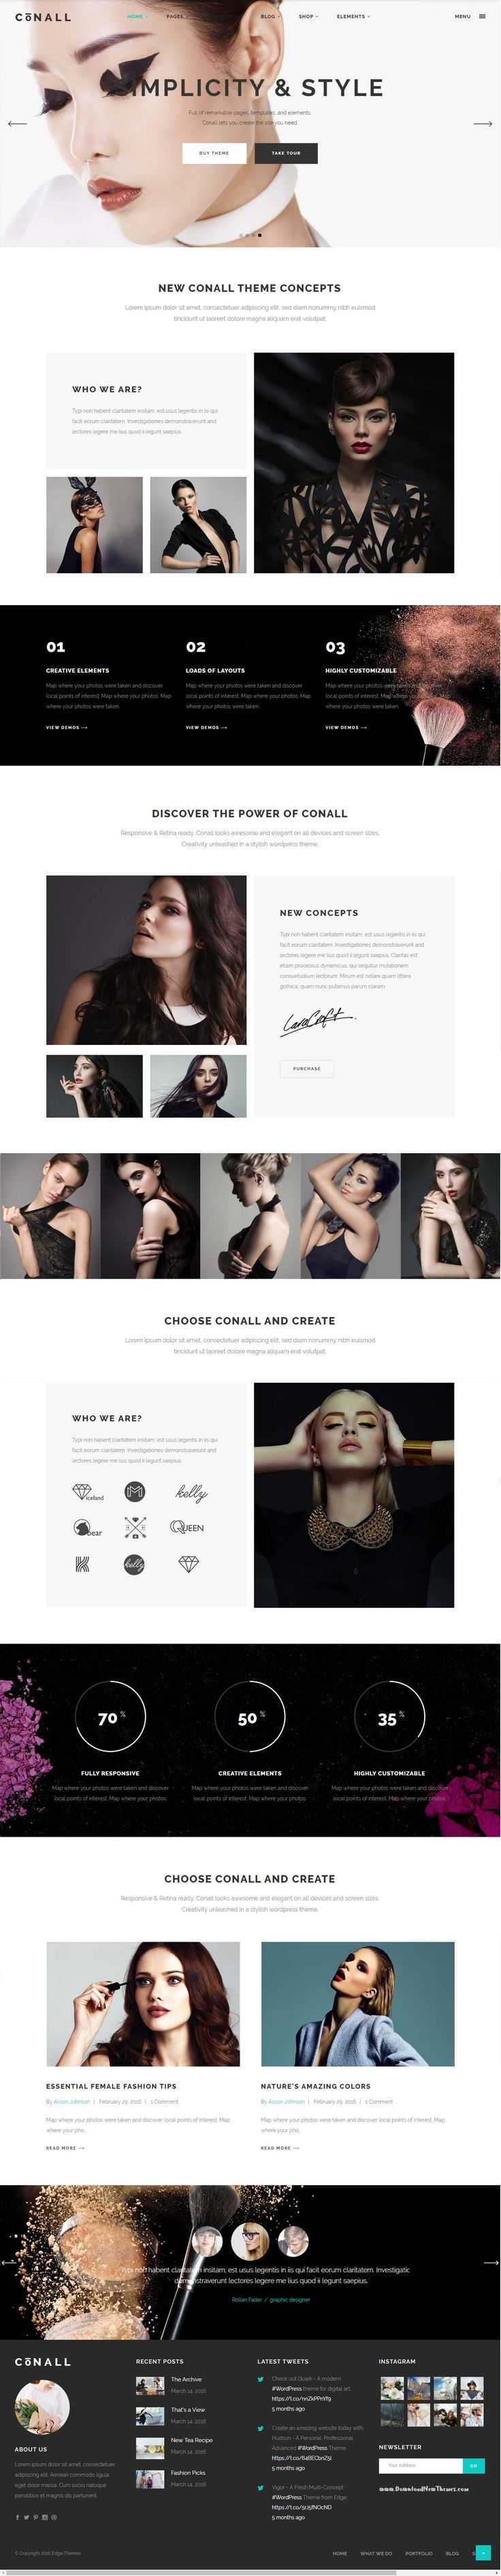 Conall - A Clean & Beautiful Multipurpose Theme